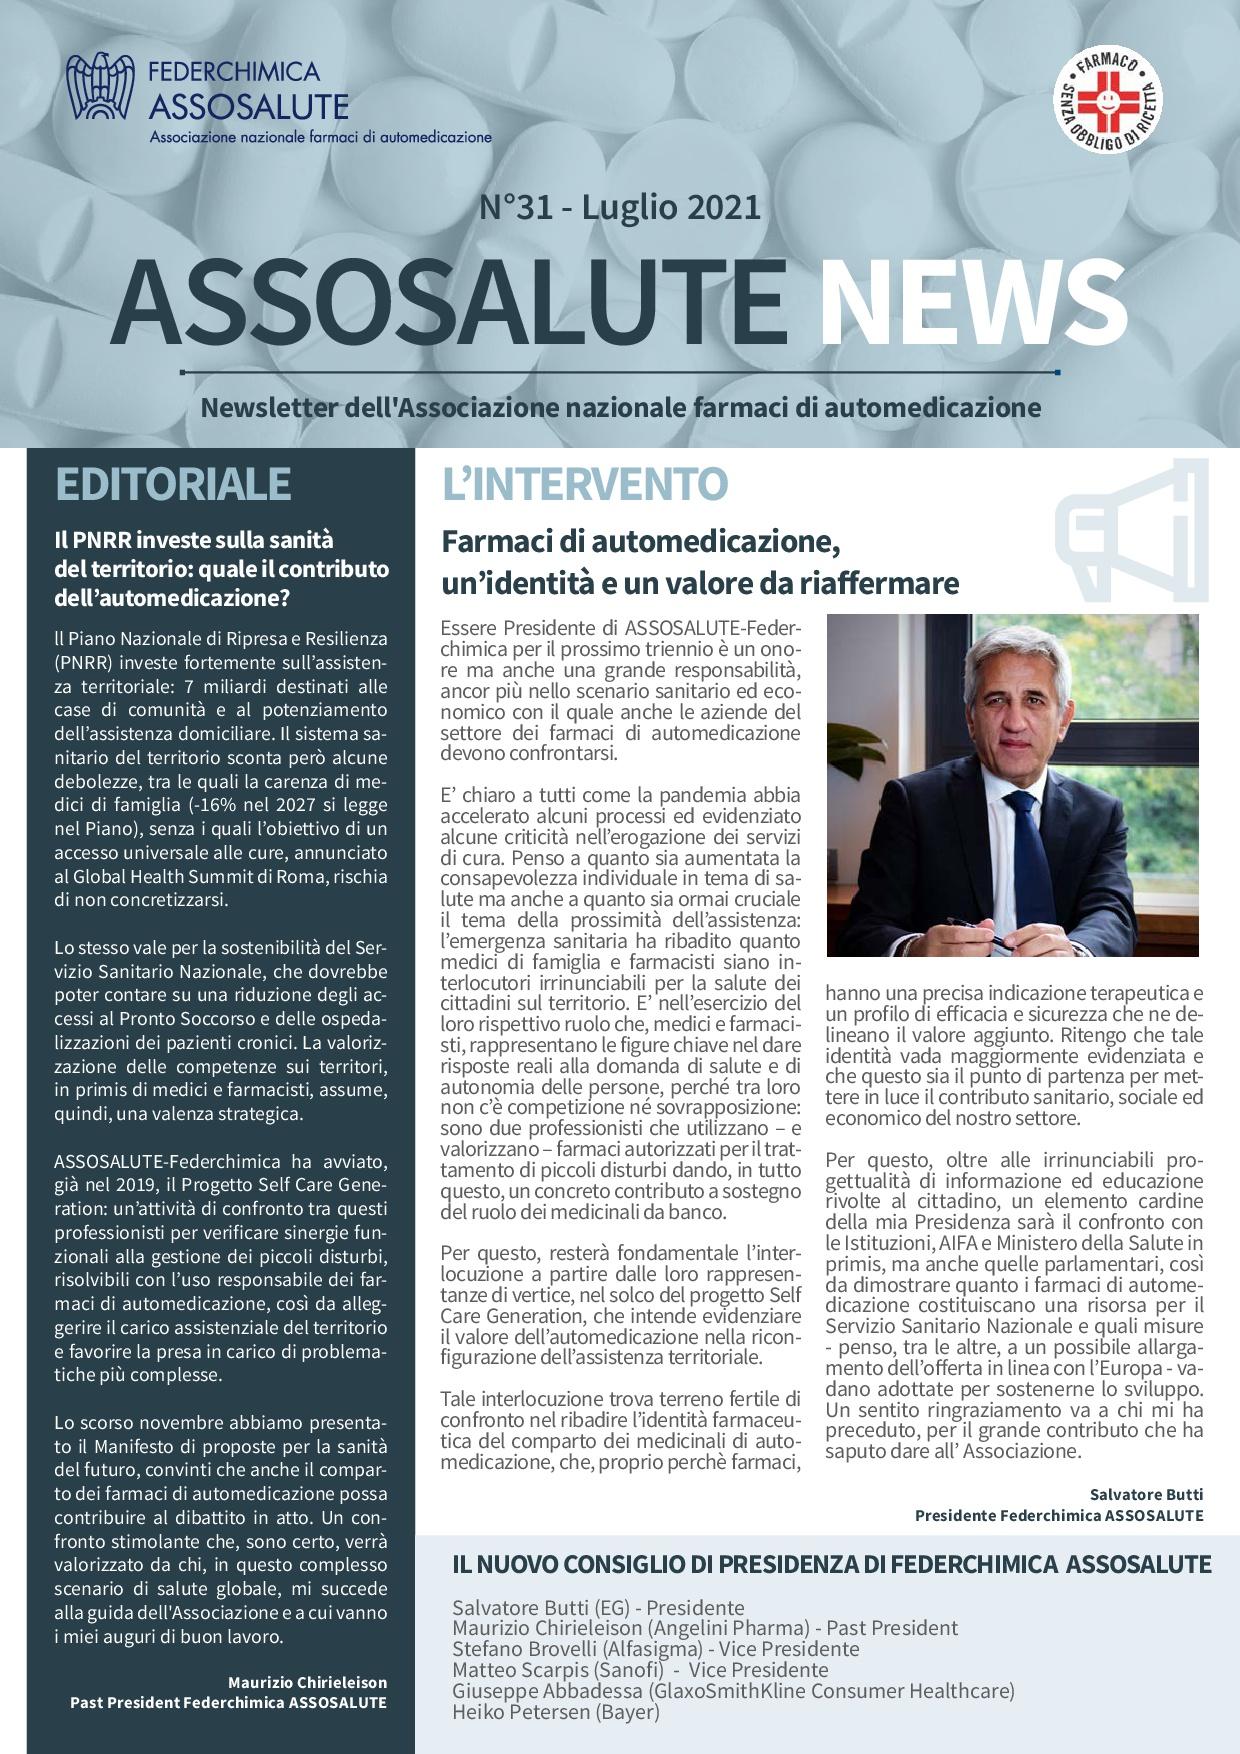 Newsletter Assosalute - Luglio 2021